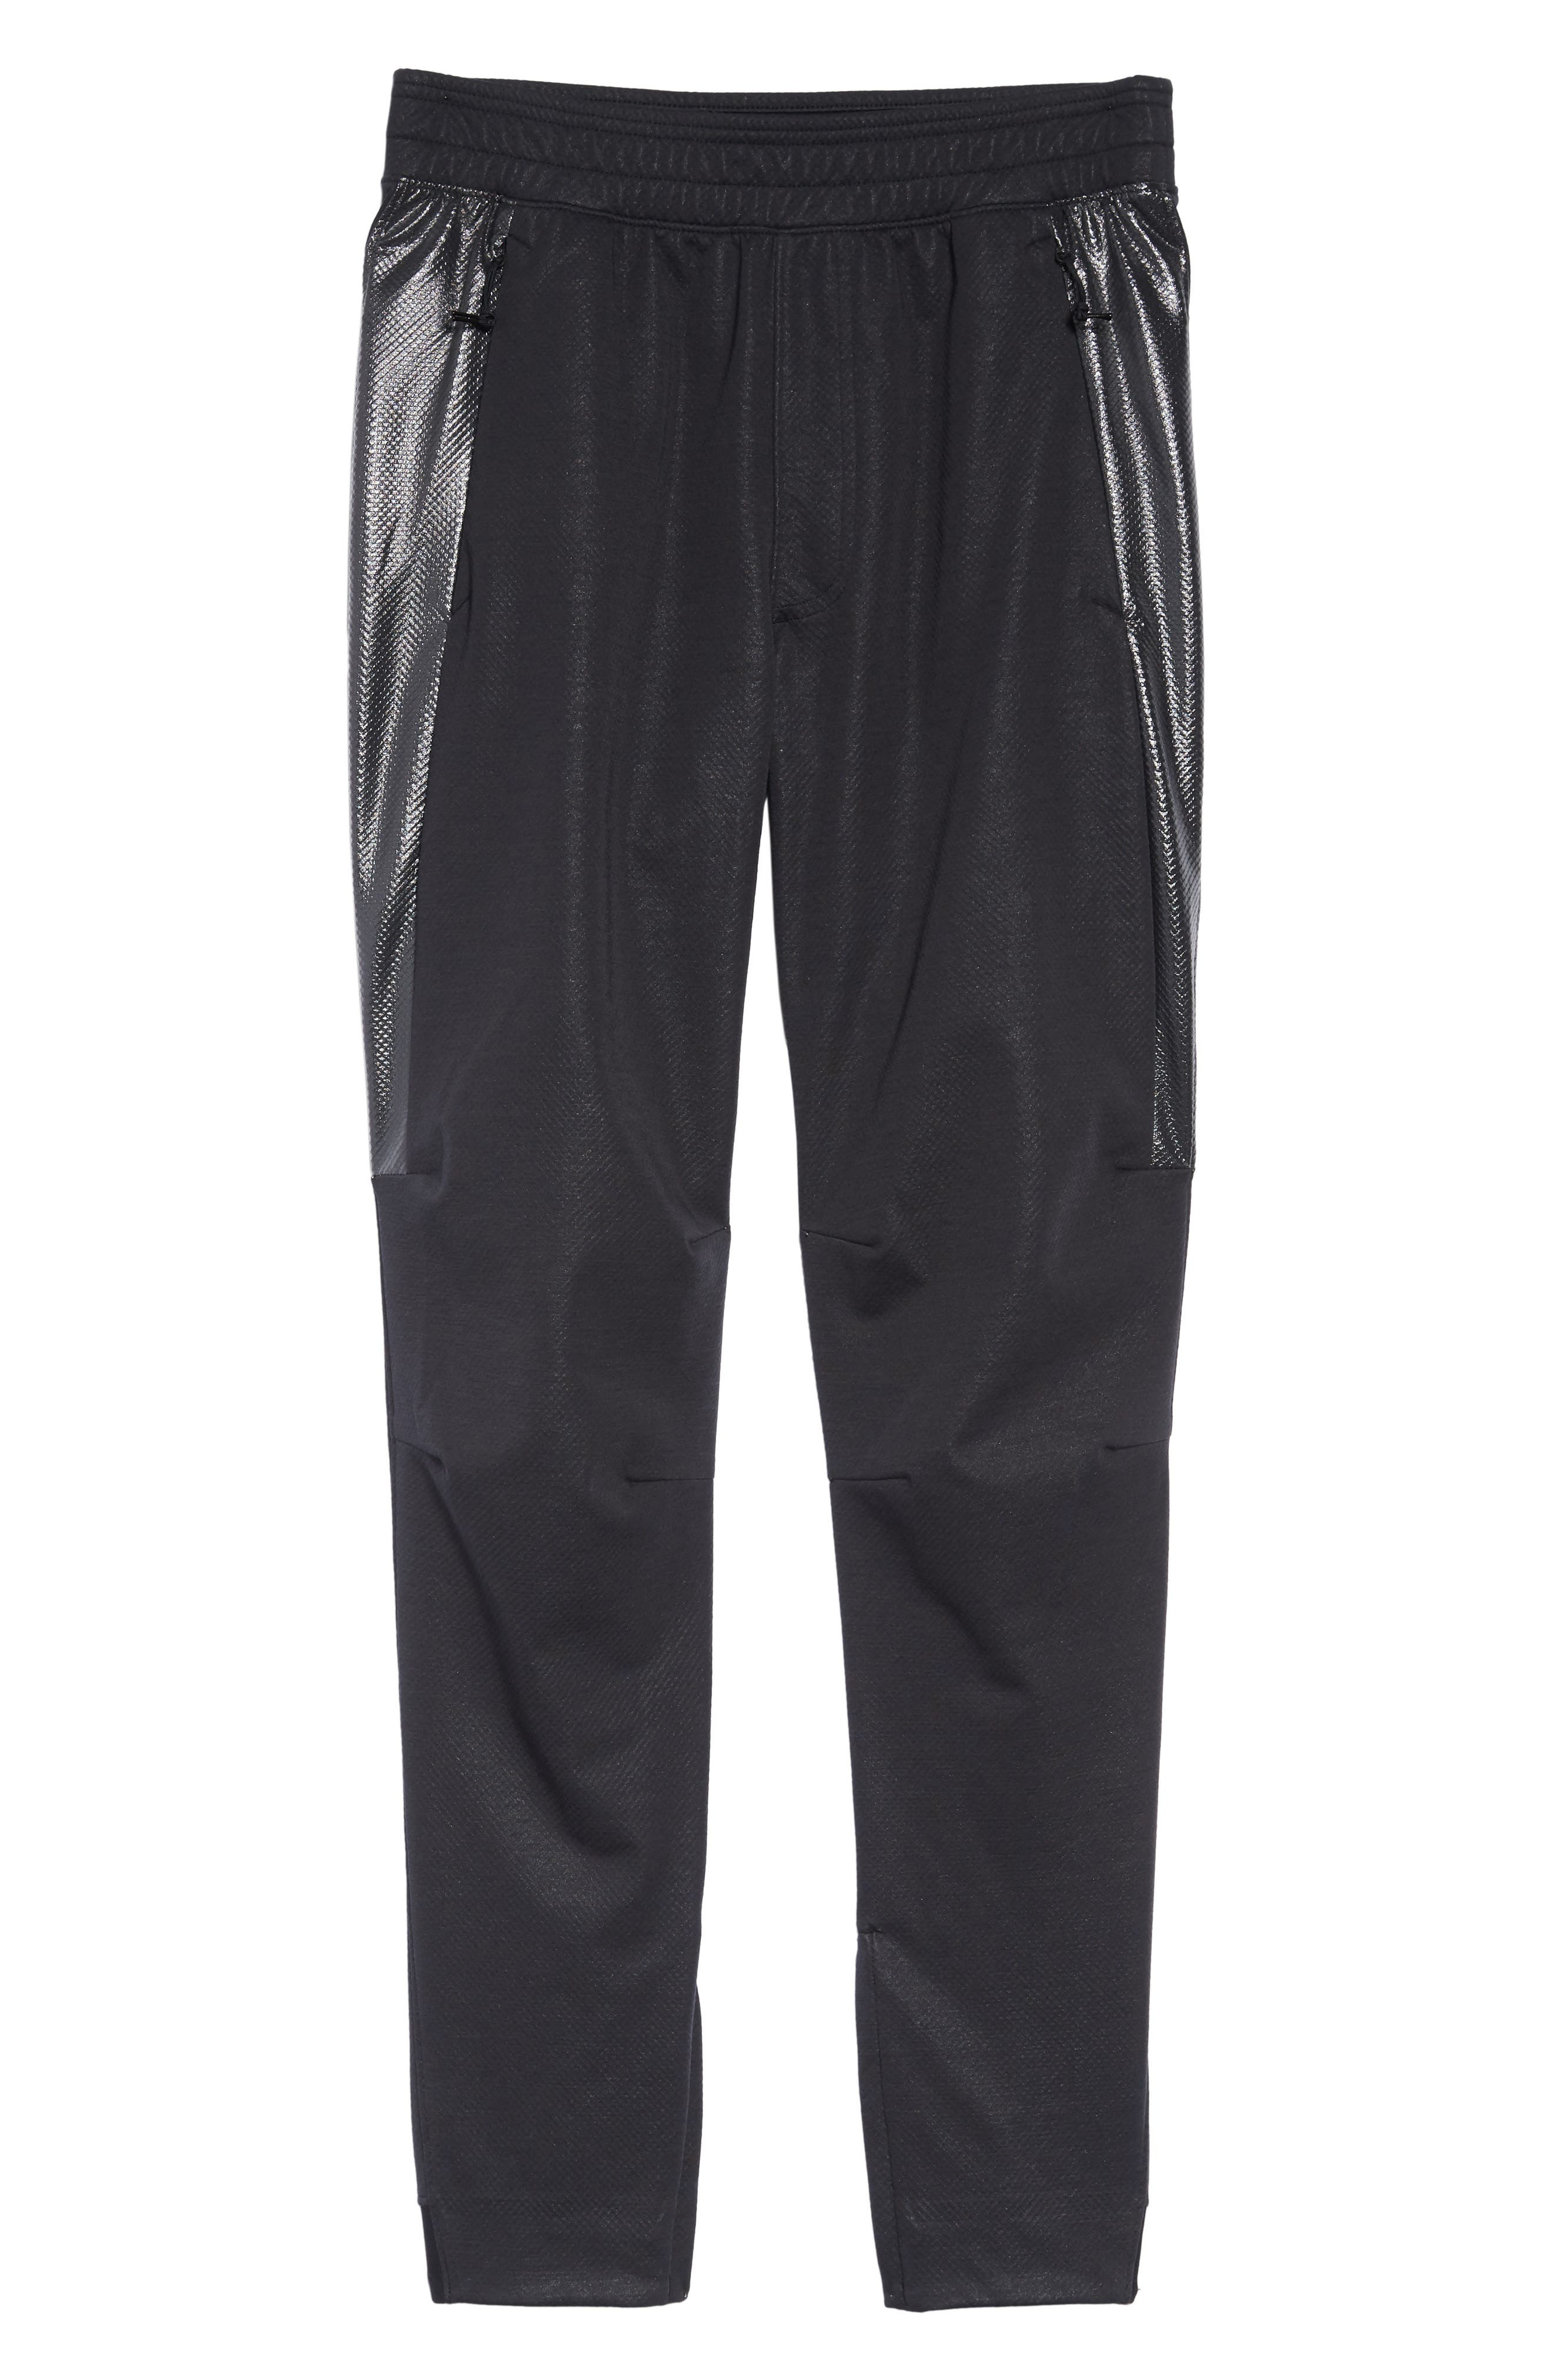 Unstoppable Swacket Training Pants,                             Alternate thumbnail 6, color,                             BLACK FULL HEATHER/ BLACK